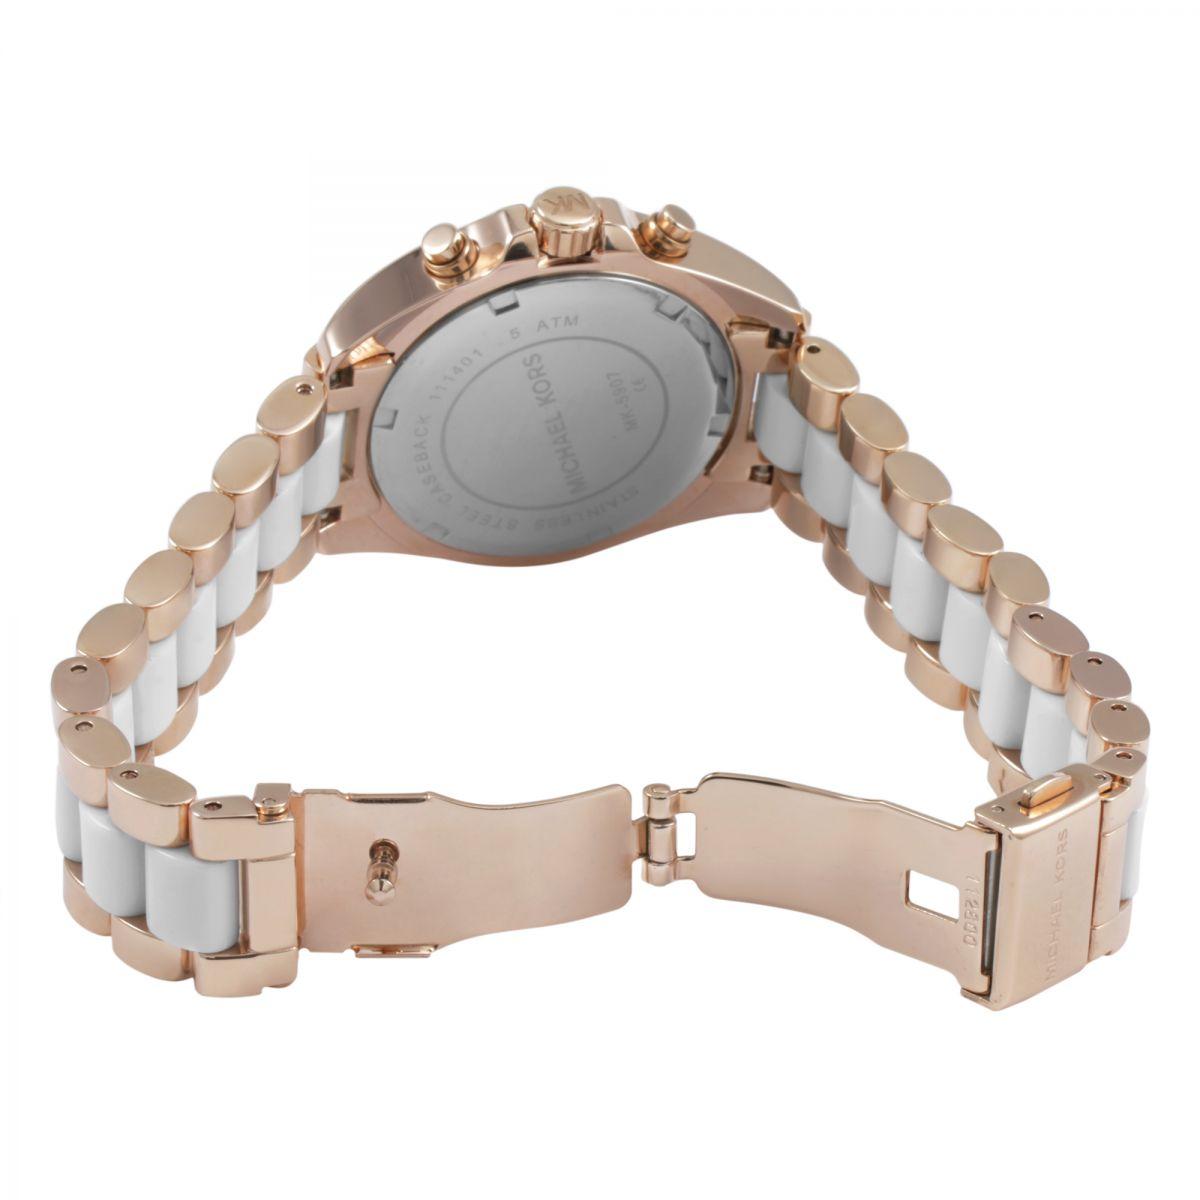 Relógio Michael Kors MK5907 Feminino